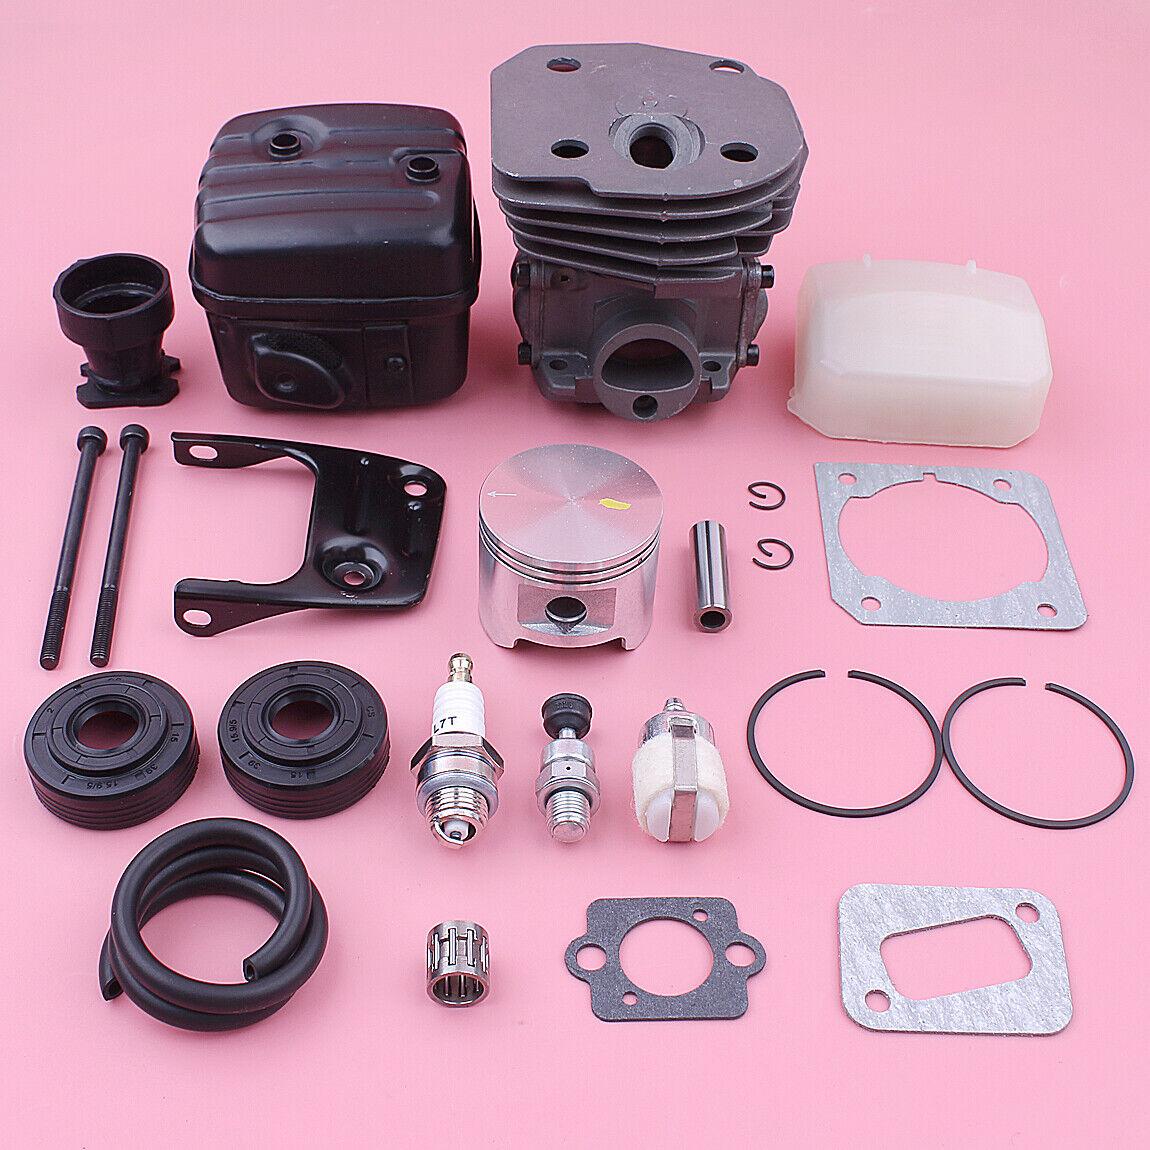 45mm Cilindro Pistón De Escape Silenciador Filtro De Aire Kit Para HUSQVARNA 353 346XP 350